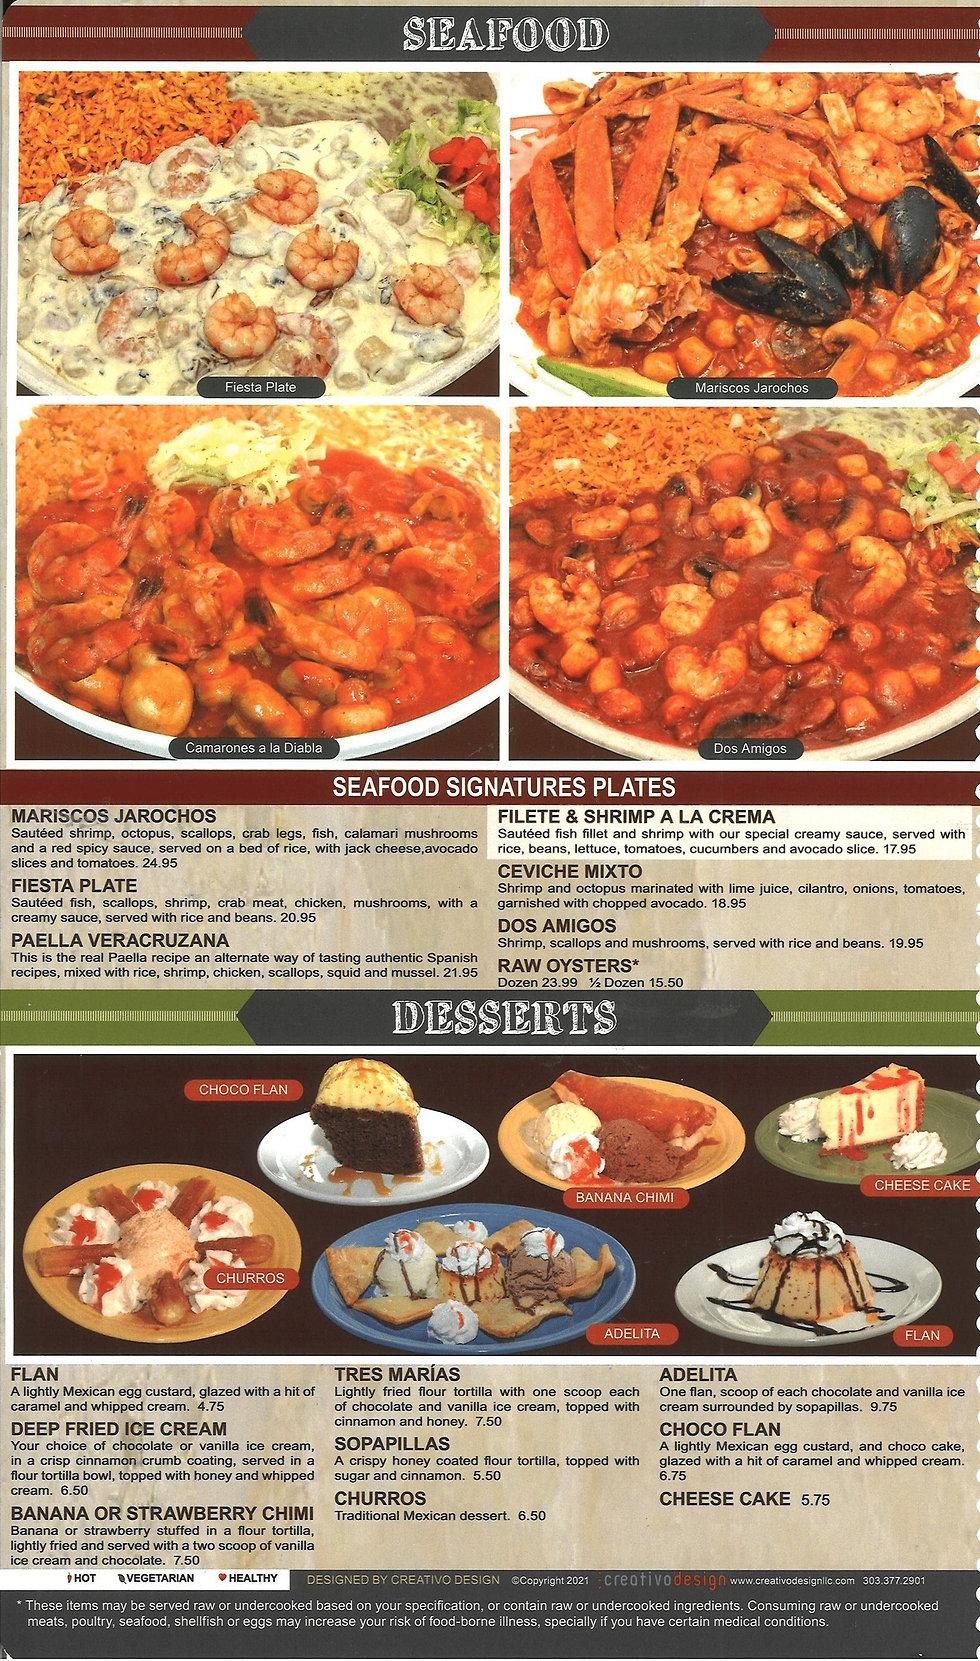 Seafood hr2.jpg